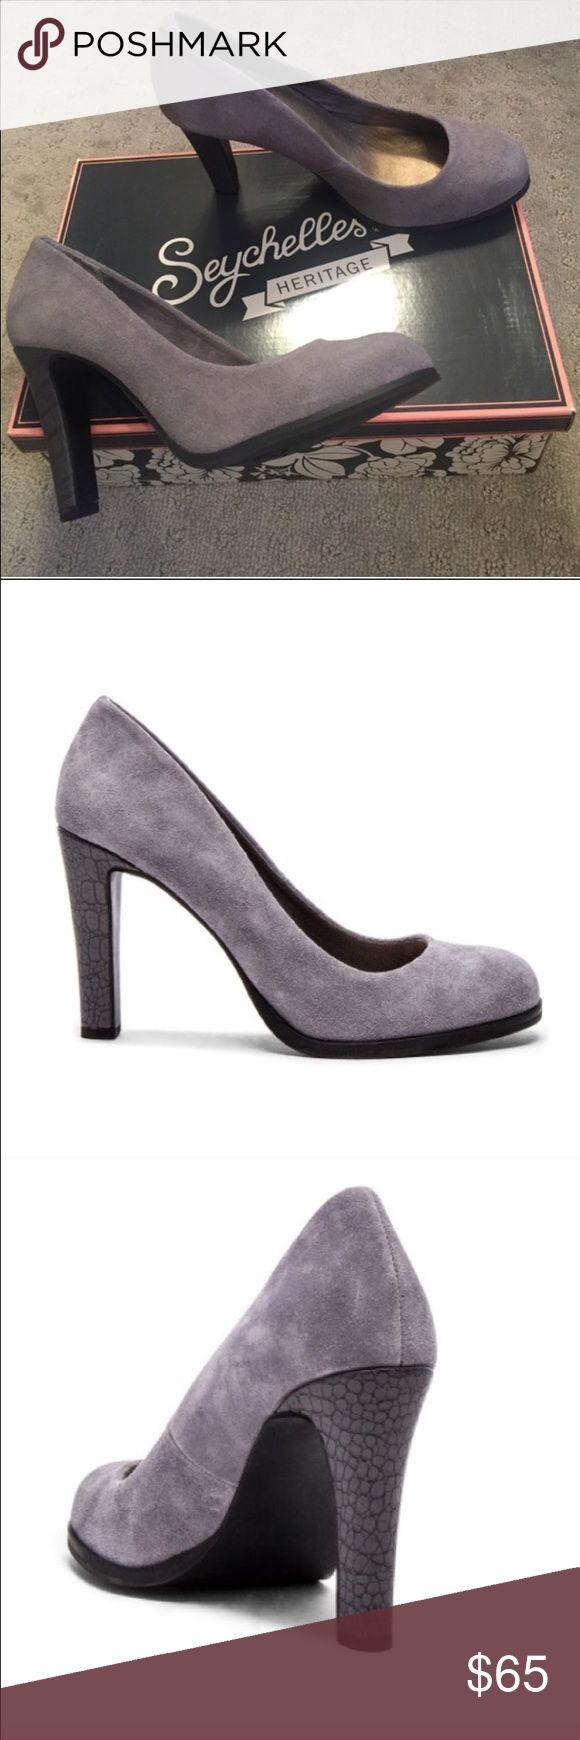 "🆕! Seychelles - keyboard suede pumps (Grey) Brand new, beautiful, original packaging, unworn. Comfortable, gorgeous suede upper with rubber sole, embossed heel, 3.5"" heel height. Seychelles Shoes Heels"